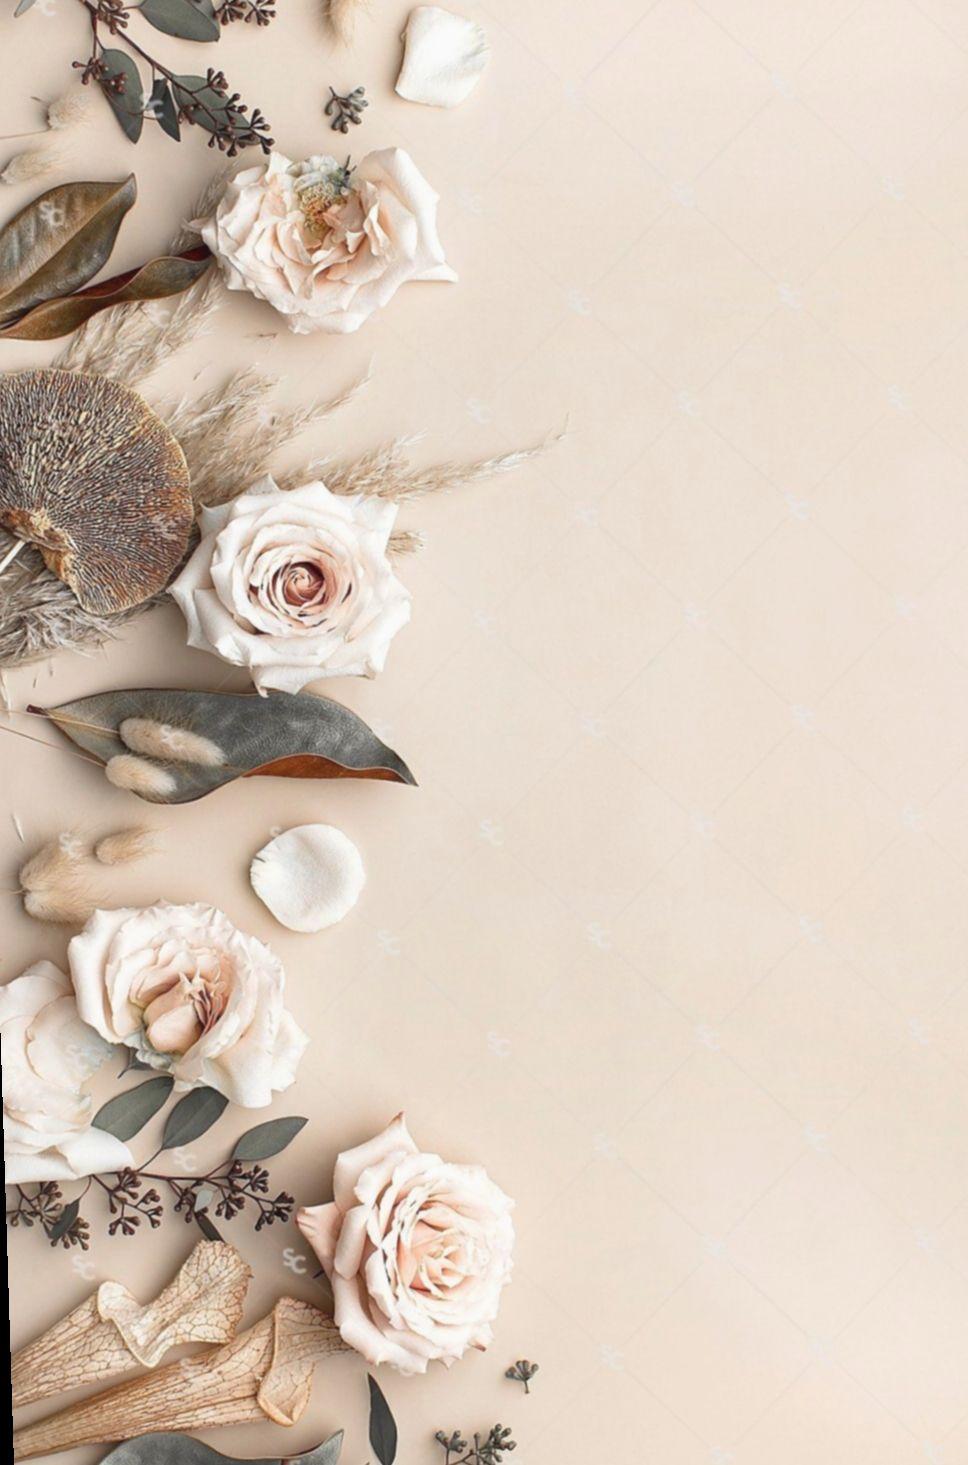 Pin By Cicegim On Wallpapers Flower Background Wallpaper Flower